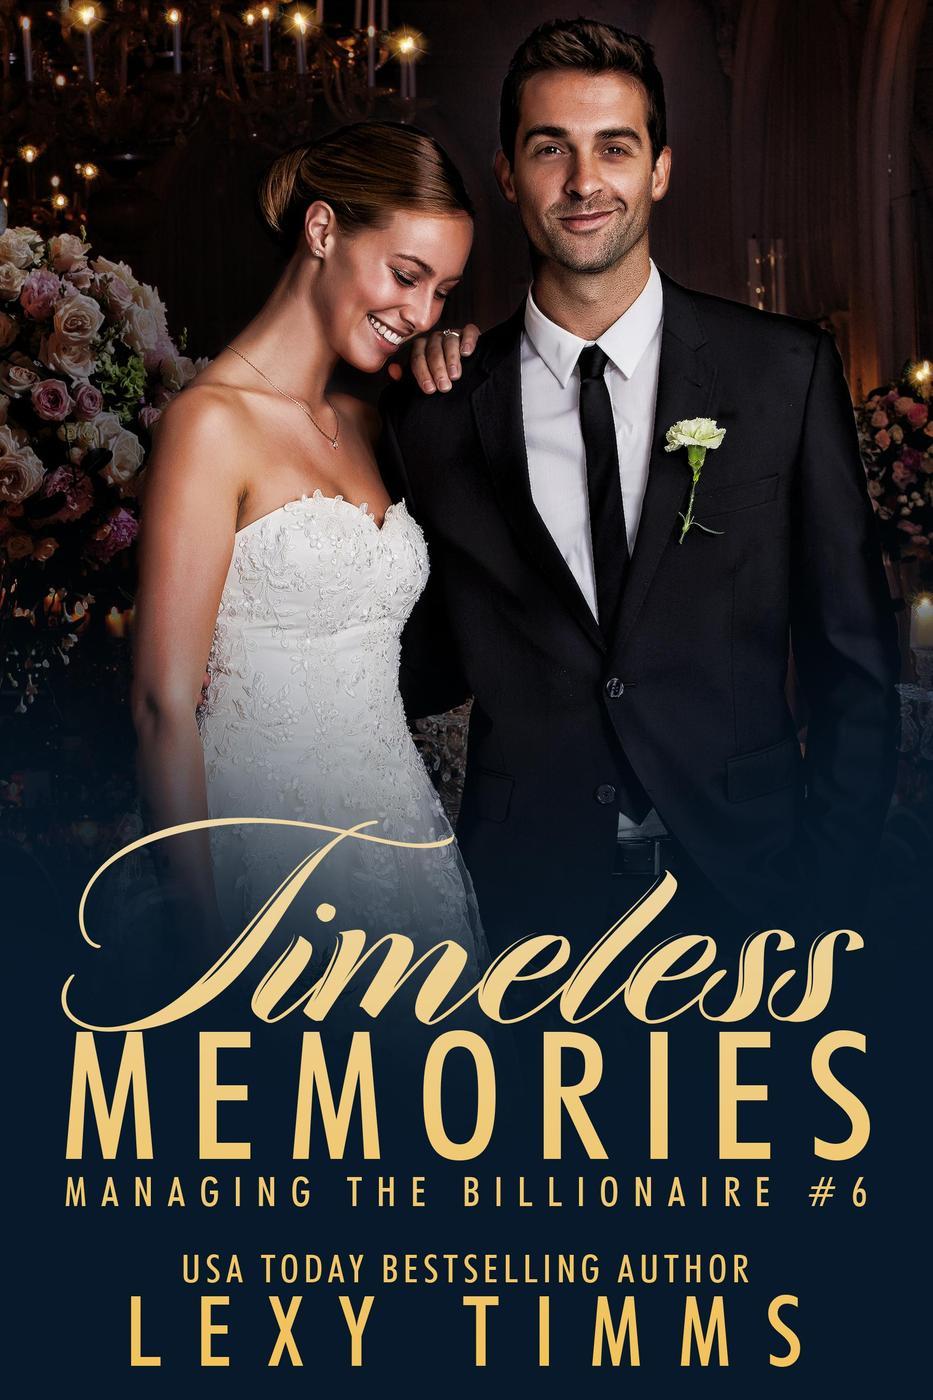 Timeless Memories (Managing the Billionaire, #6)